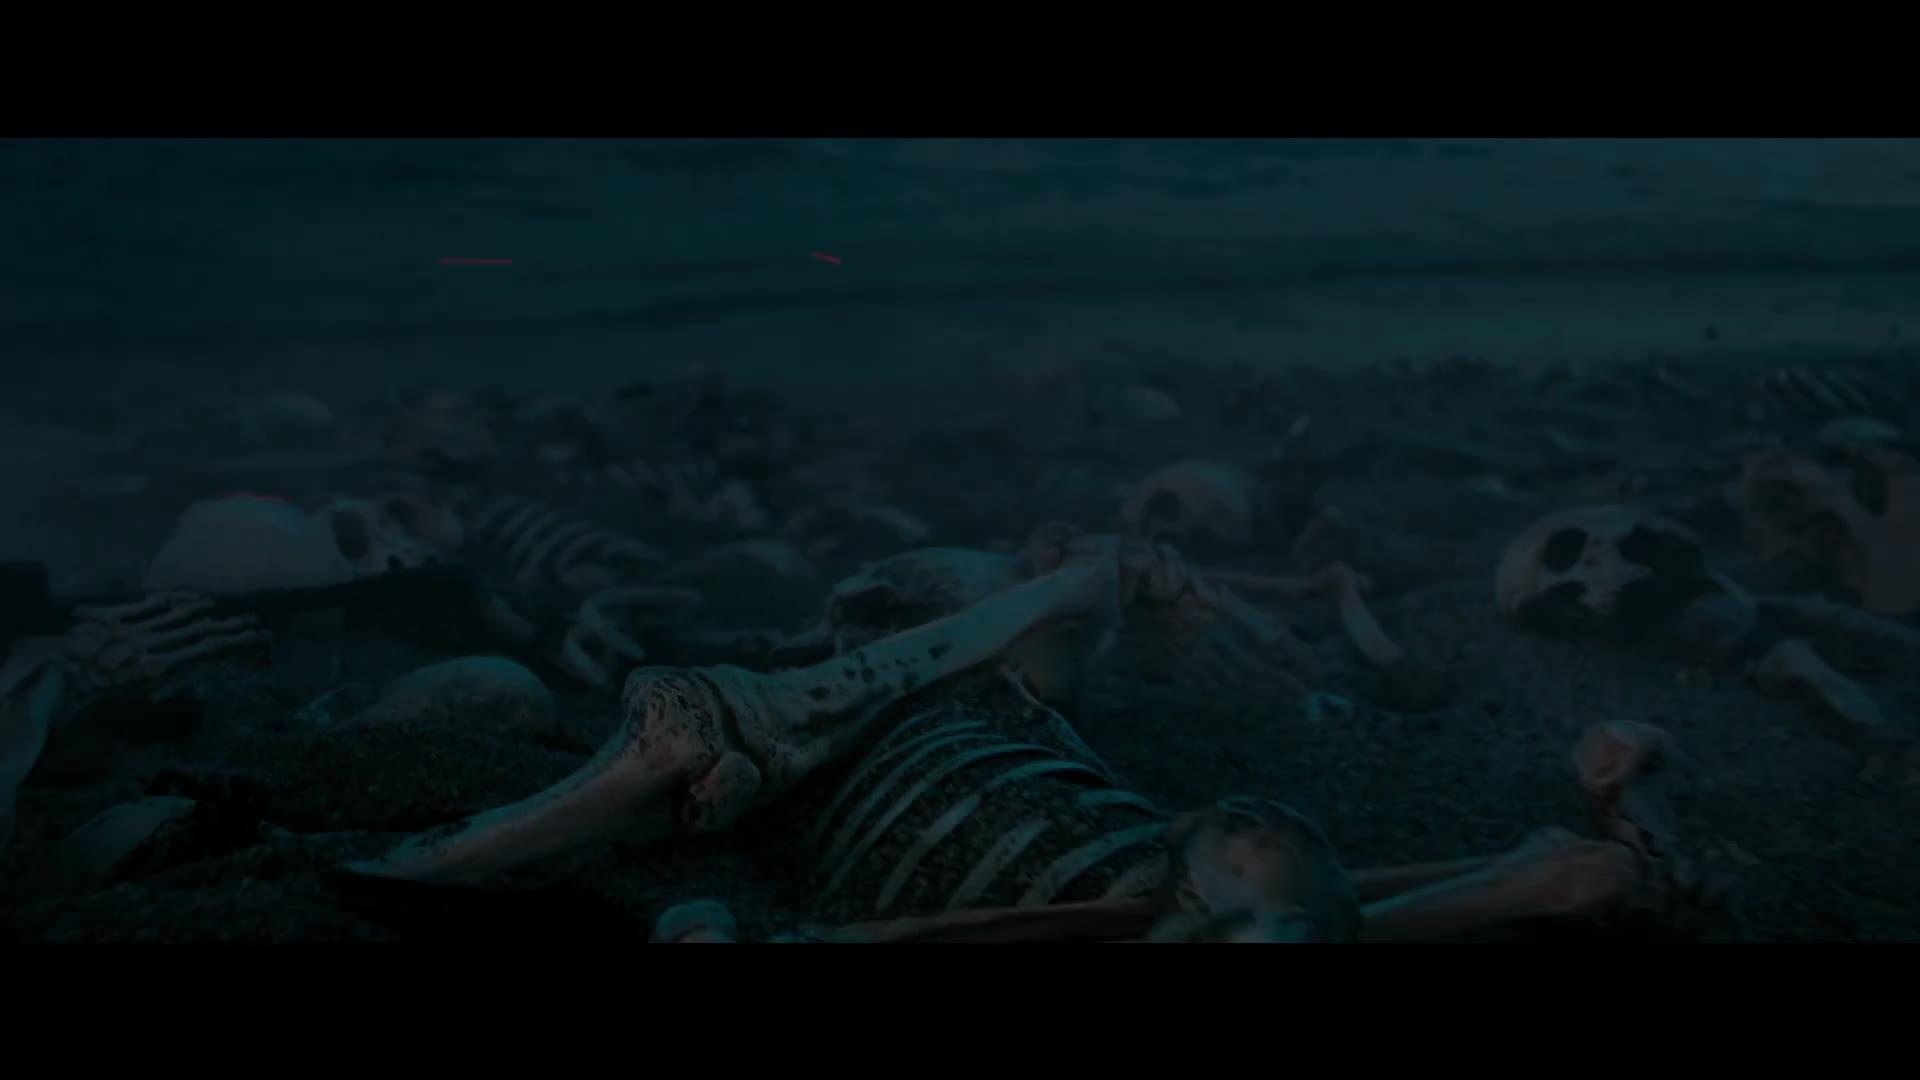 Terminator: Dark Fate - Official Trailer #2 [HD] screen capture